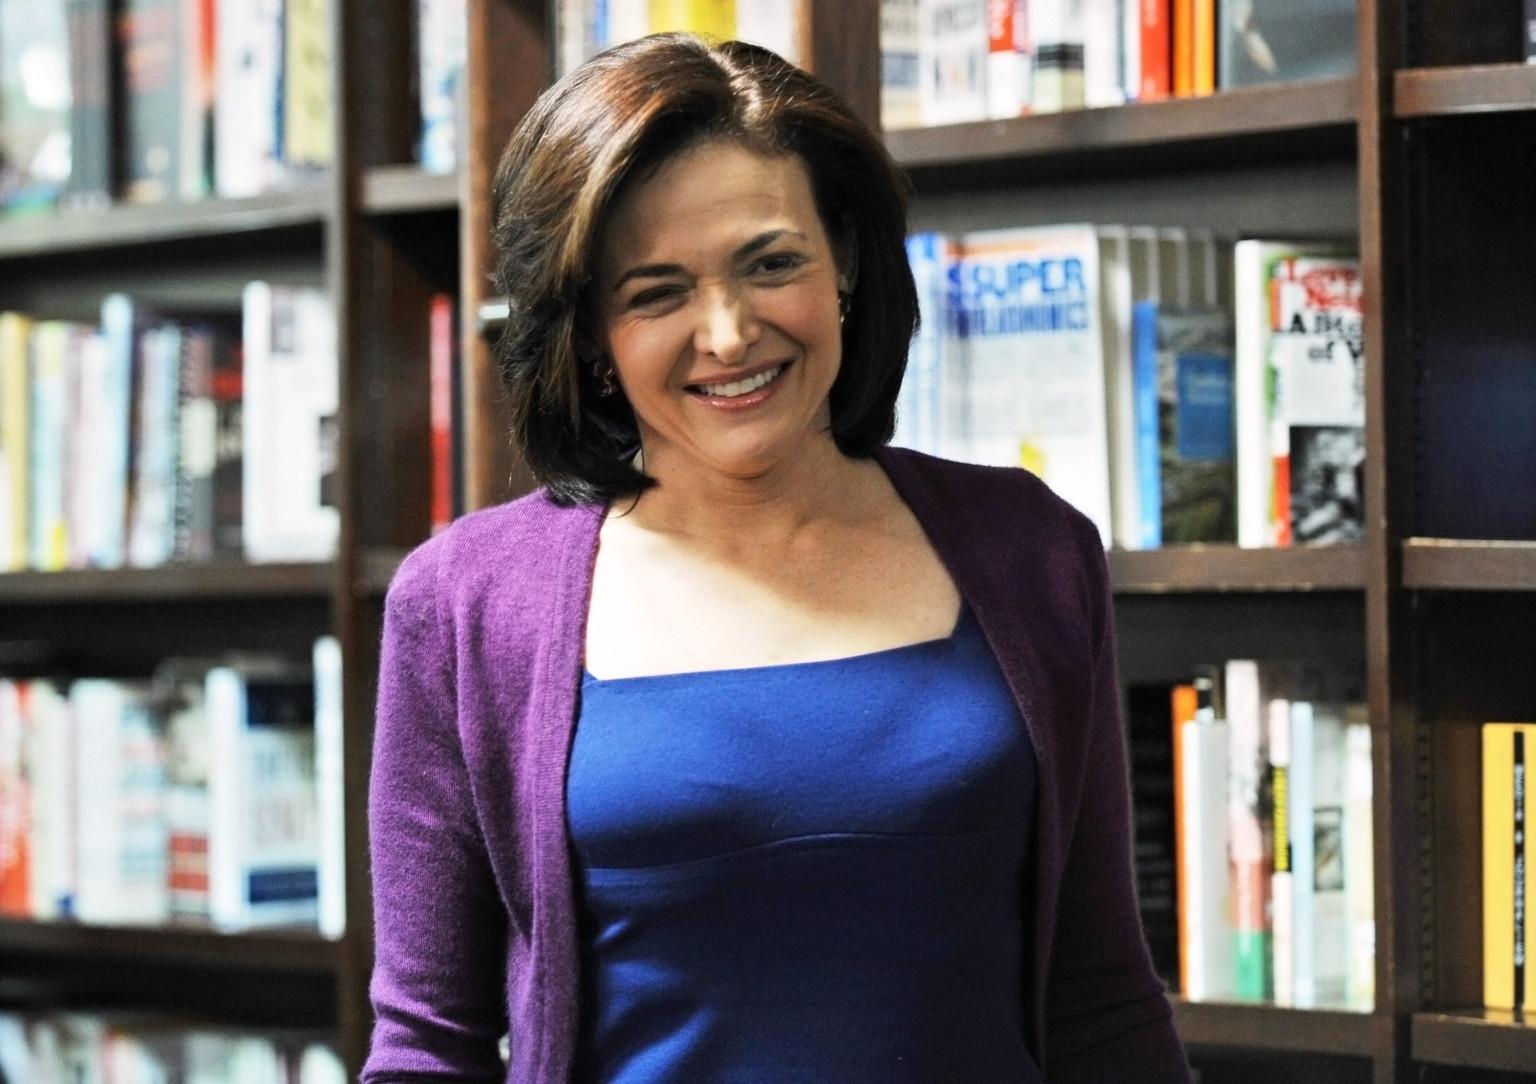 Sheryl Sandberg On Why We Have Too Few Women Leaders ... Sheryl Sandberg Photos